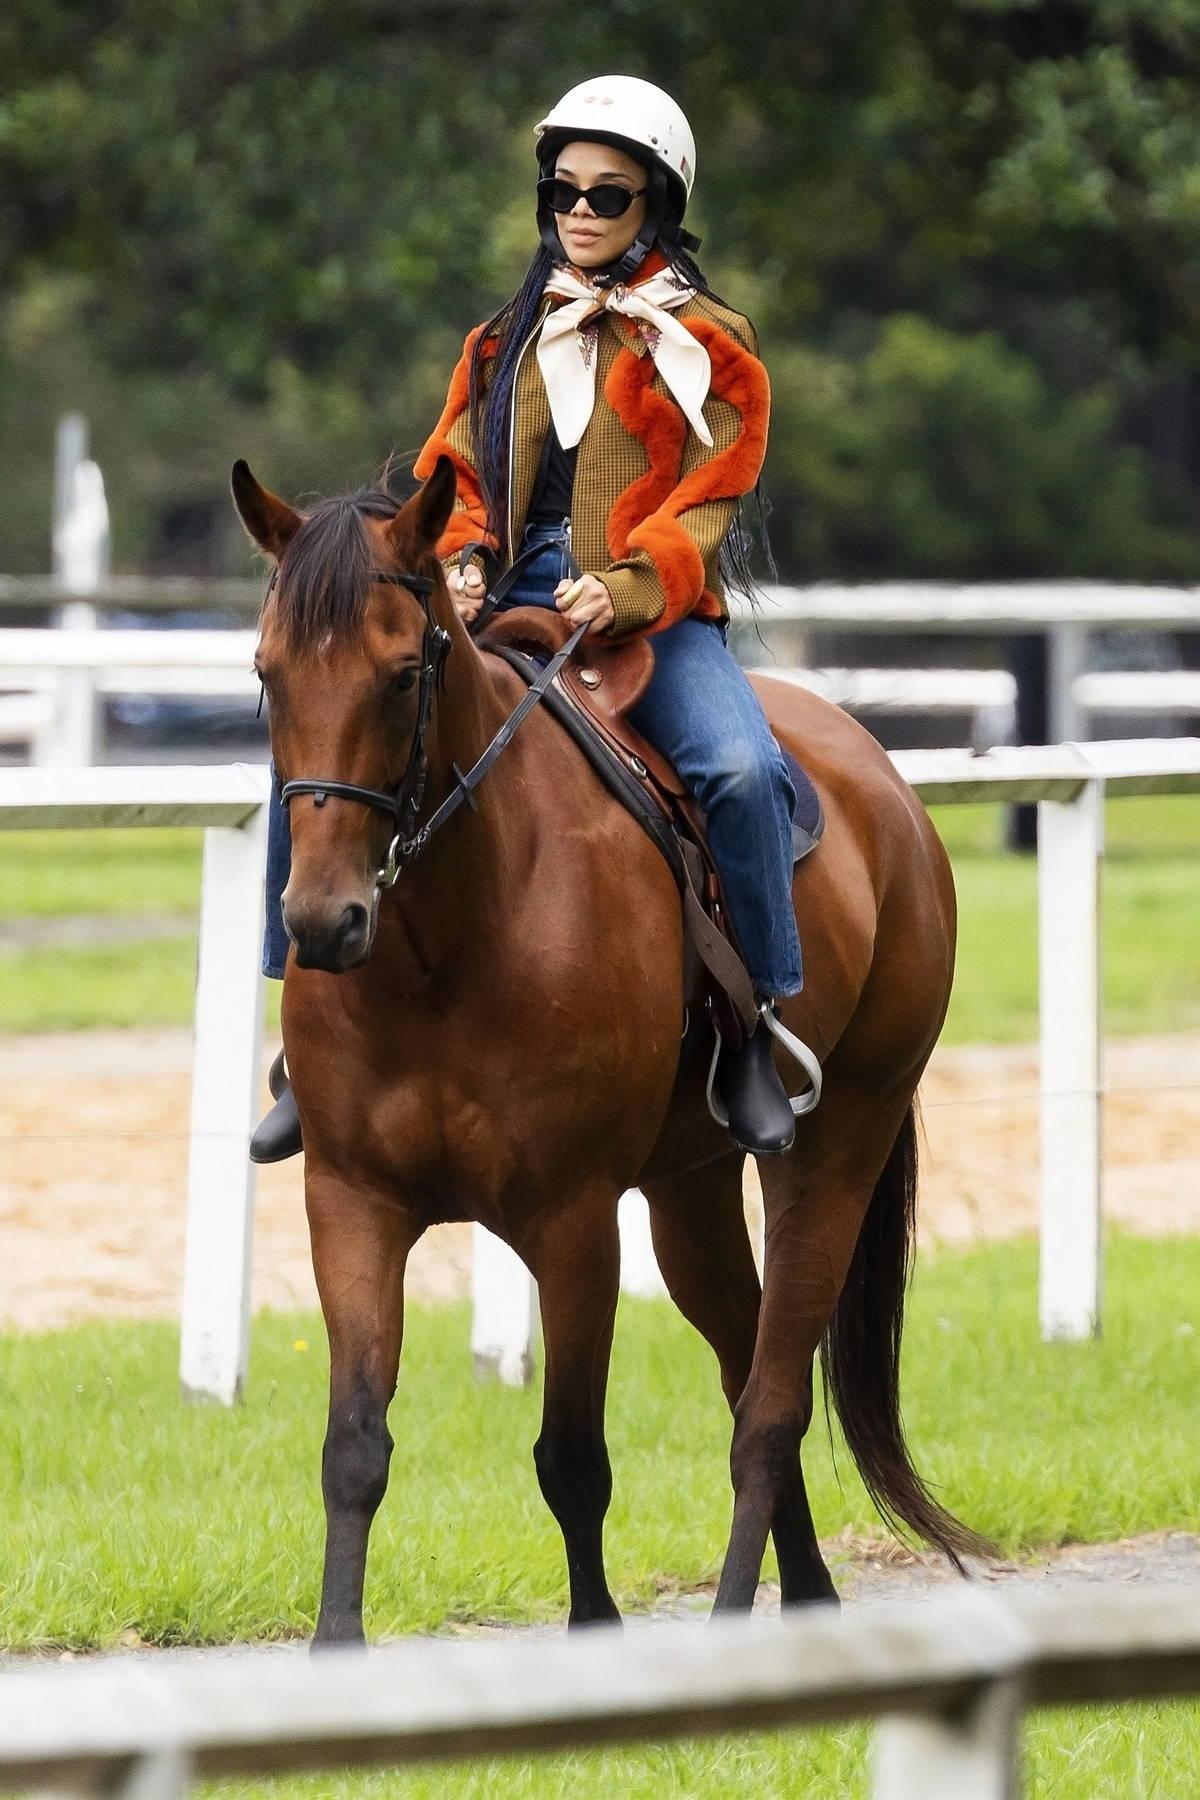 Tessa Thompson takes horse riding lessons at Centennial Park in Sydney, Australia